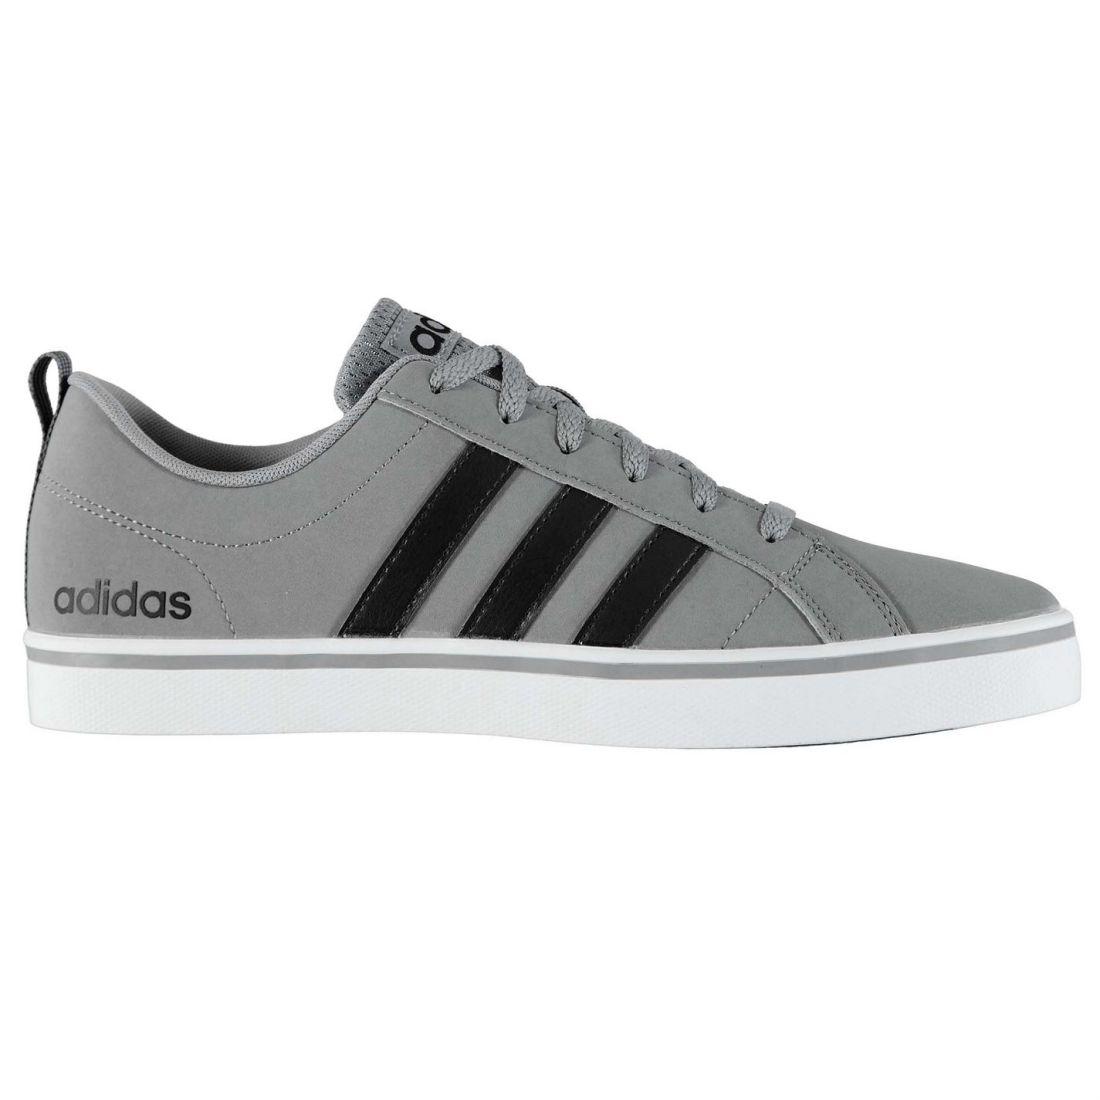 b45d022ea0e22 adidas Mens Pace VS Nubuck Trainers Shoes Lace Up Tonal Stitching ...